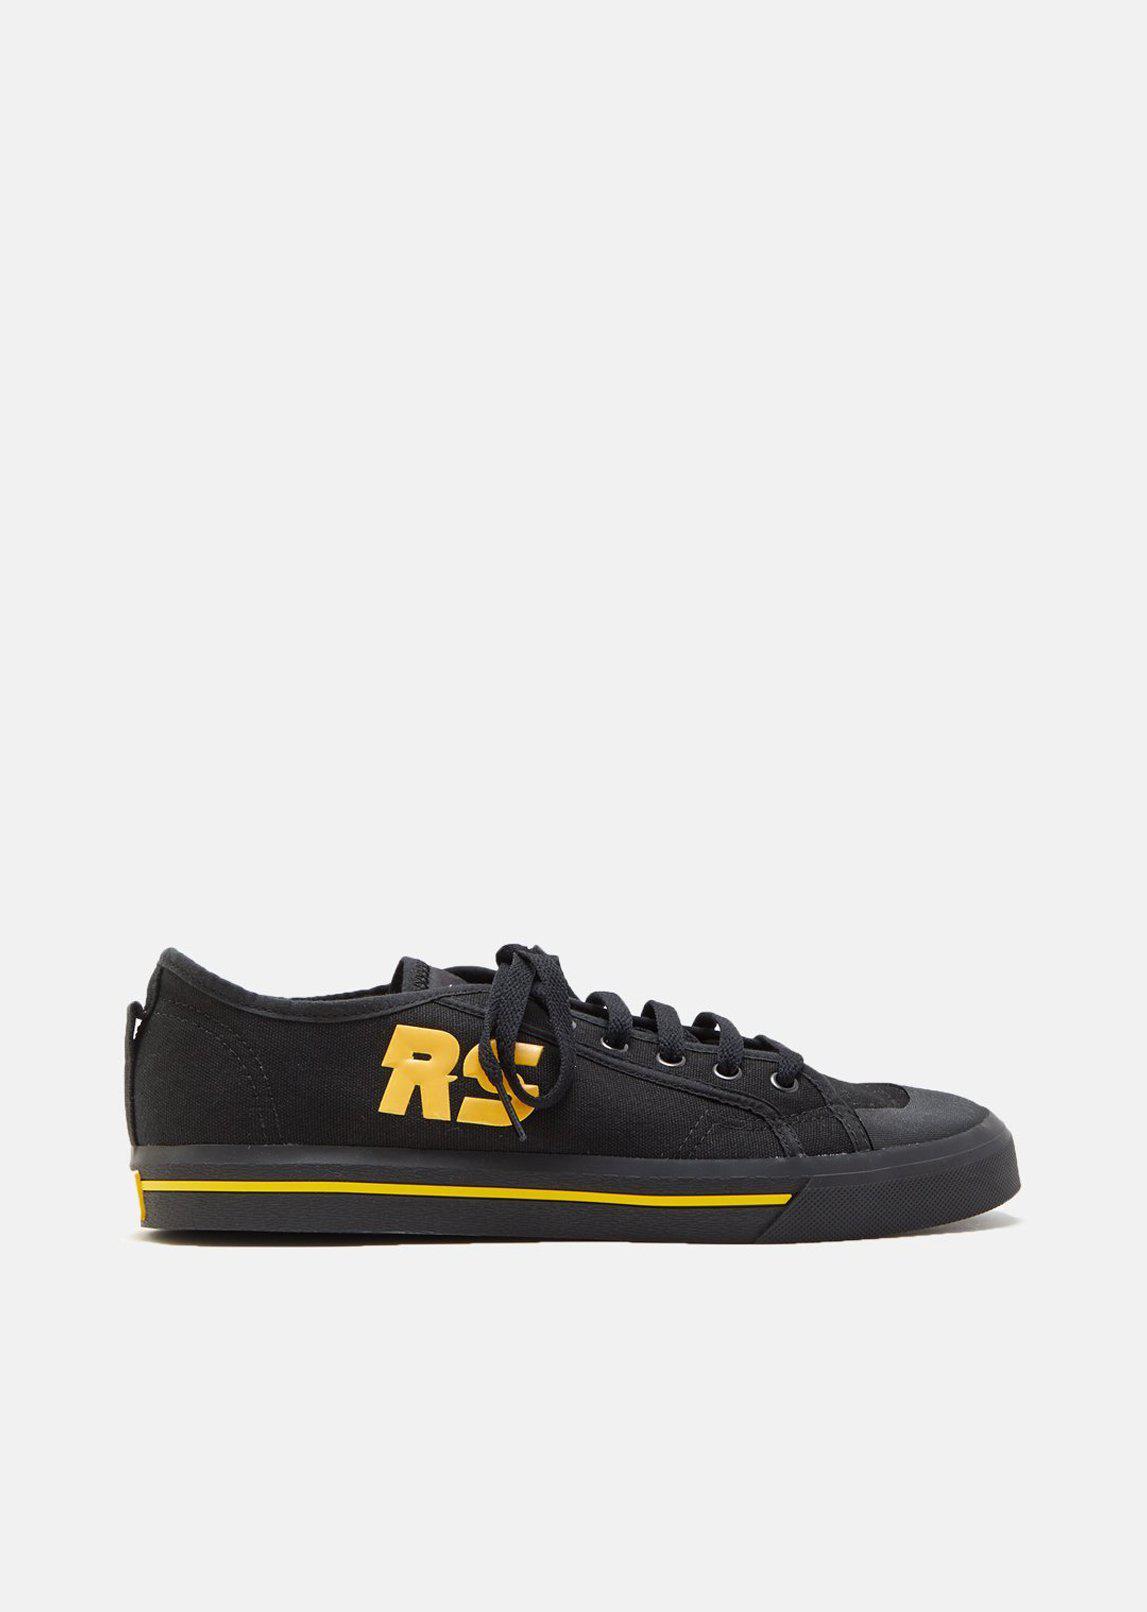 Dolce & Gabbana Black adidas Originals Edition Spirit V Sneakers fqLoWgUT